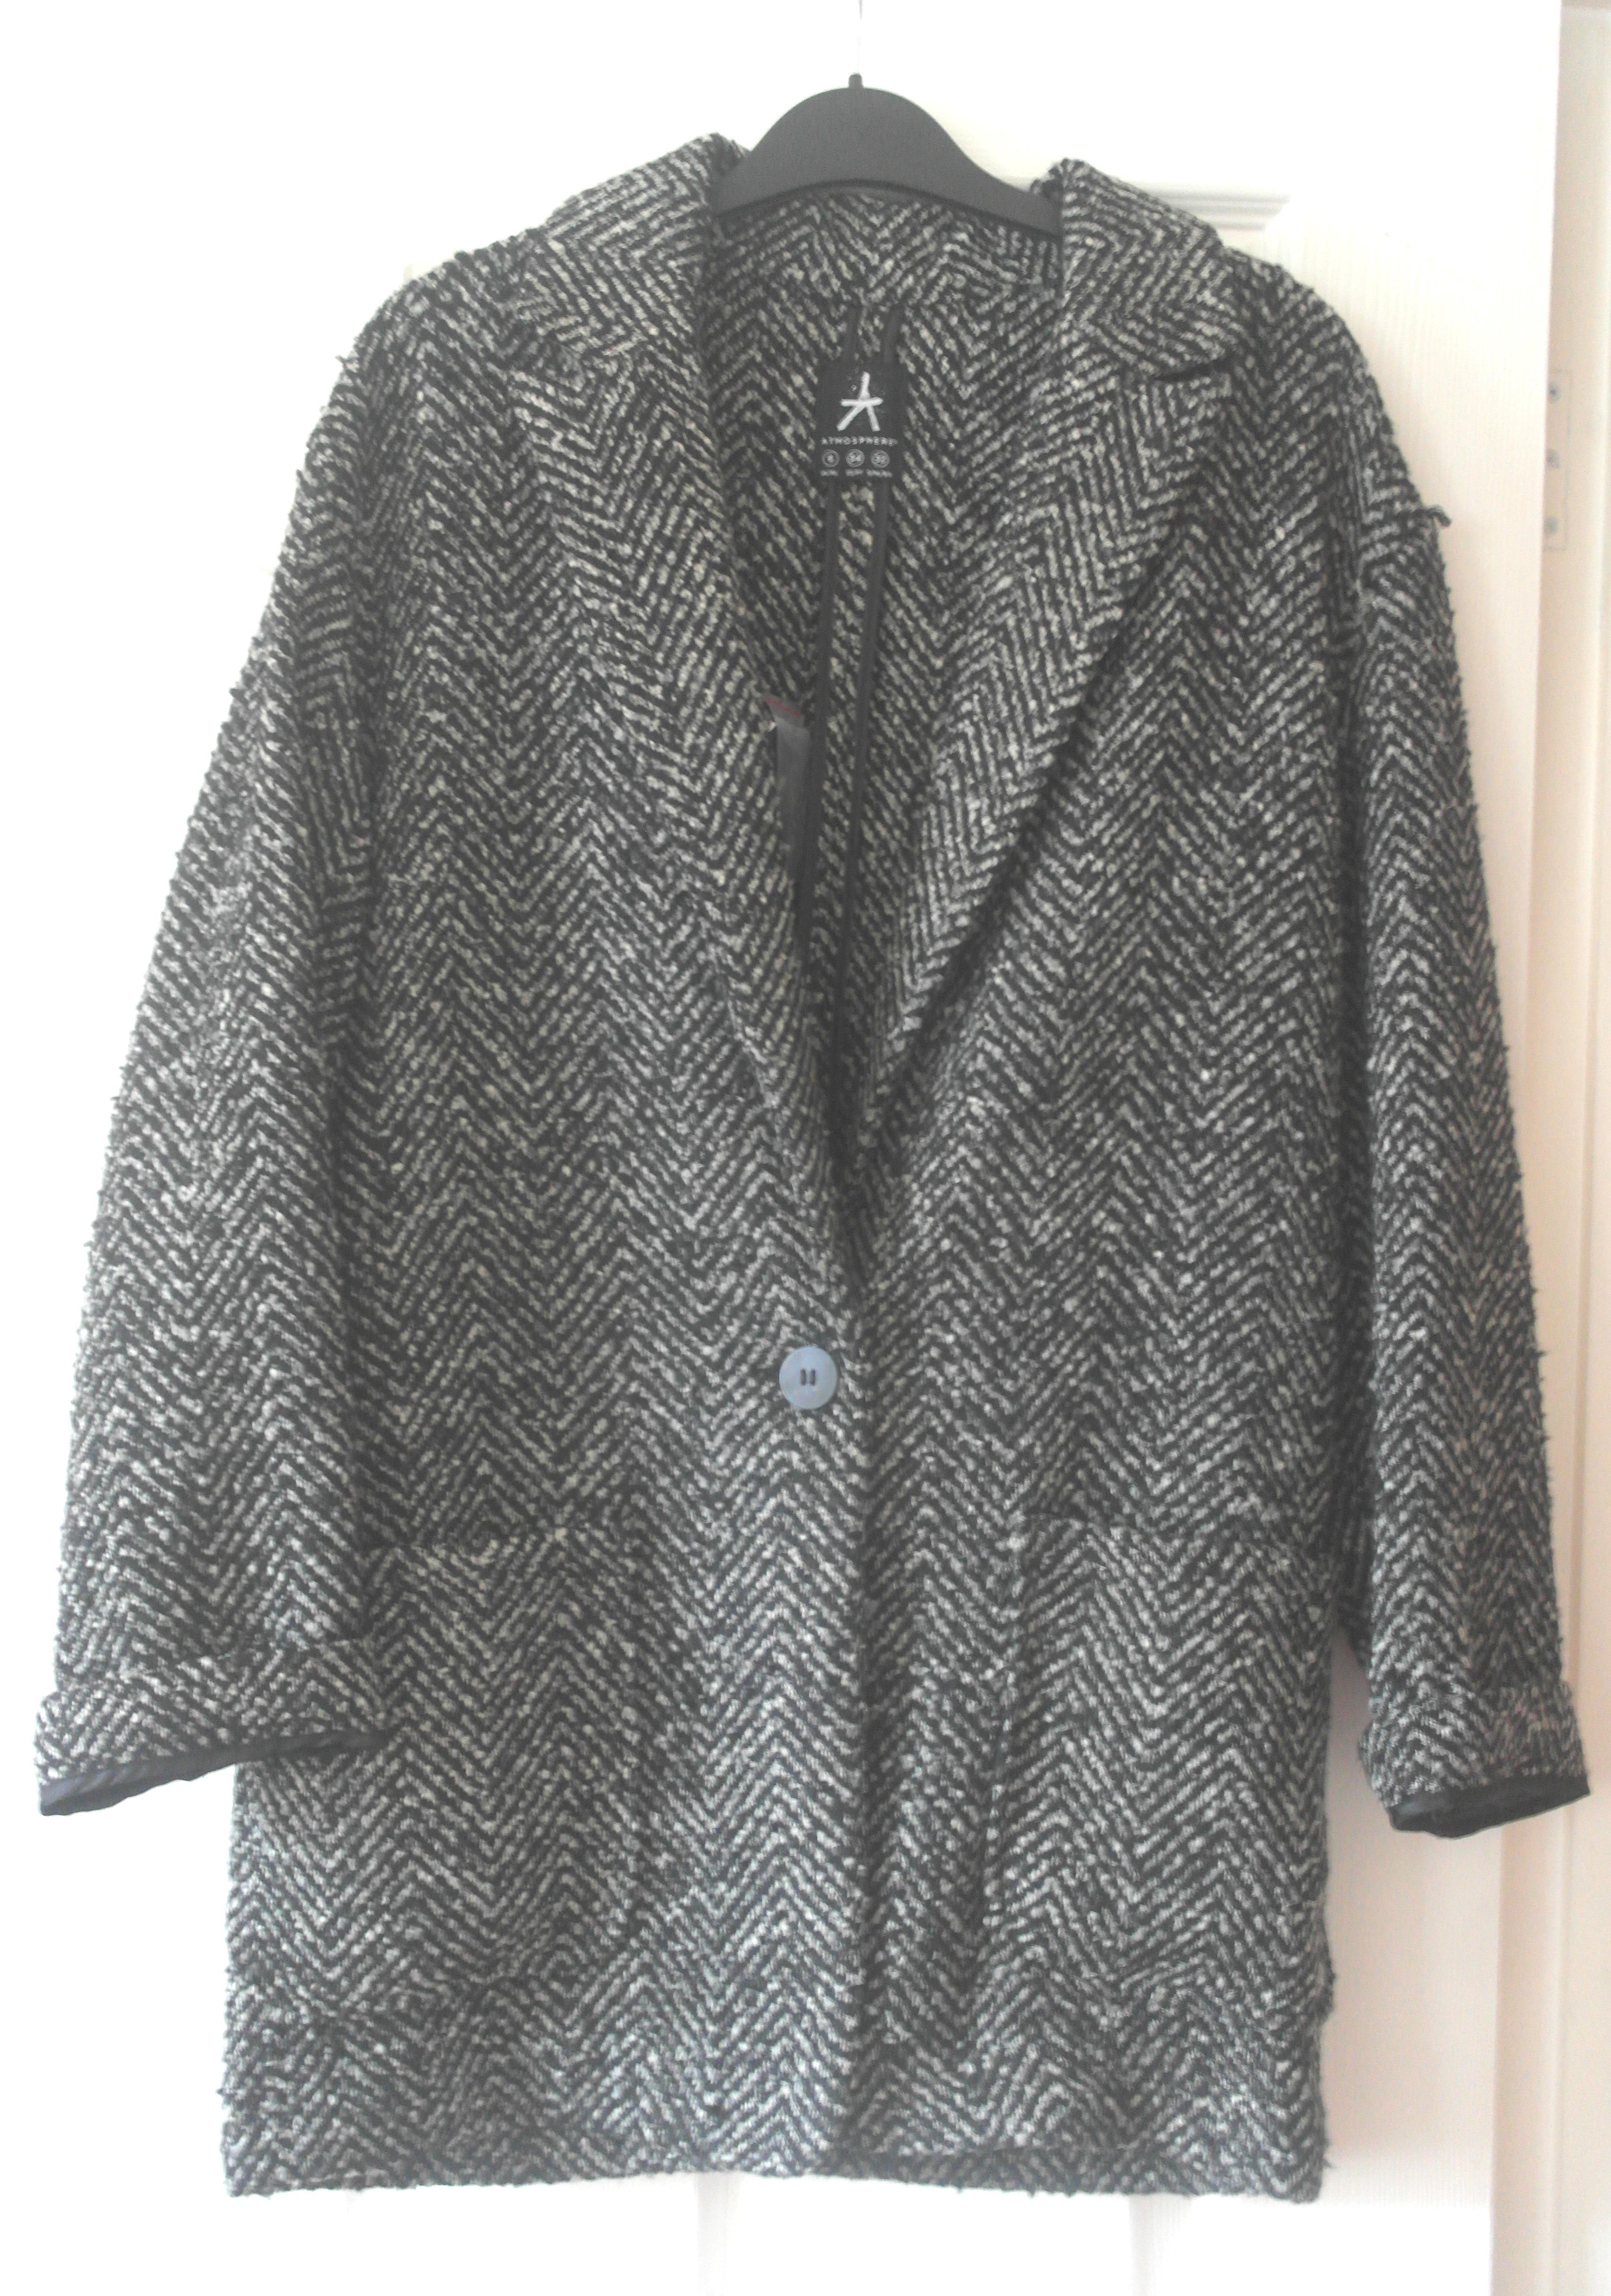 the grey boyfriend coat in a frenzy and a dream #0: 008